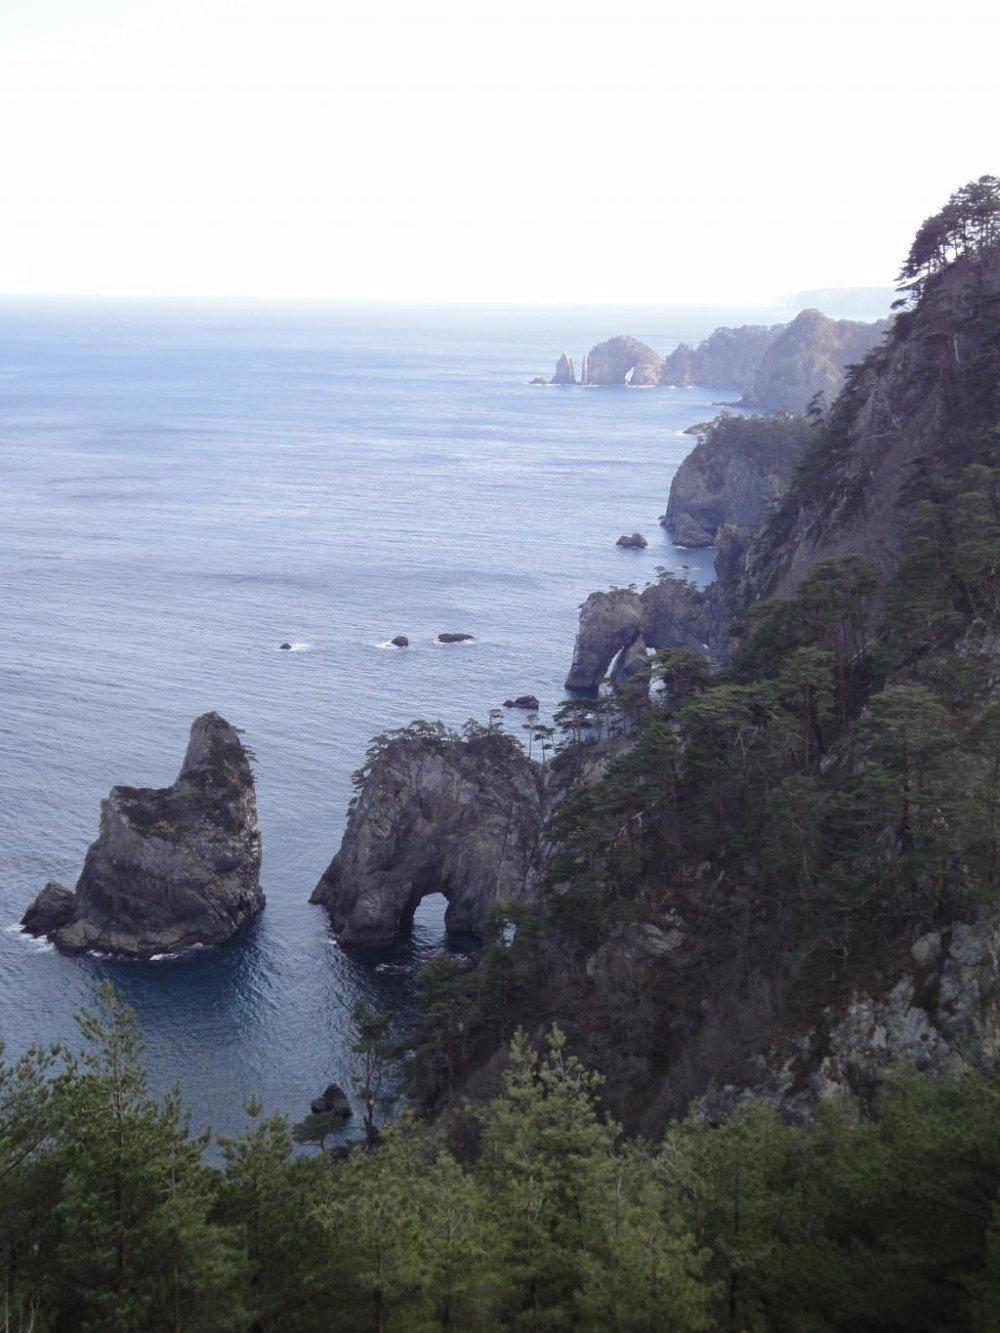 View from the top of Kitayamazaki